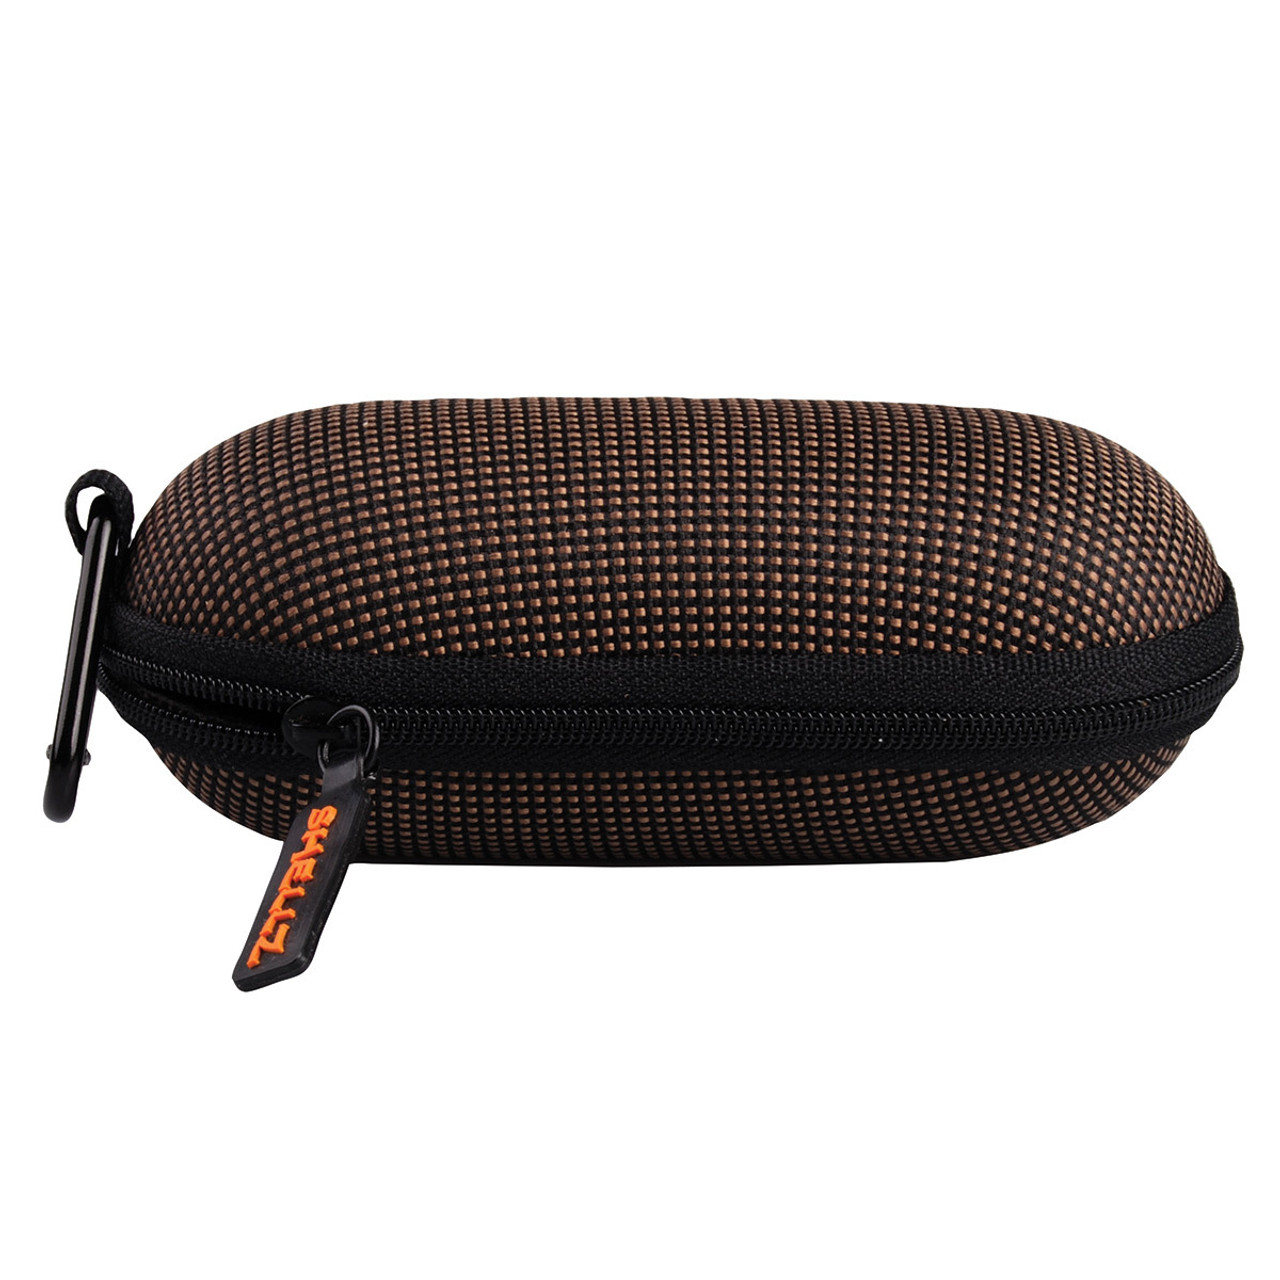 Shellz Zipper Case glass pipe protection UNS Wholesale Smoke Shop Head Shop Novelty Supplies Wholesale